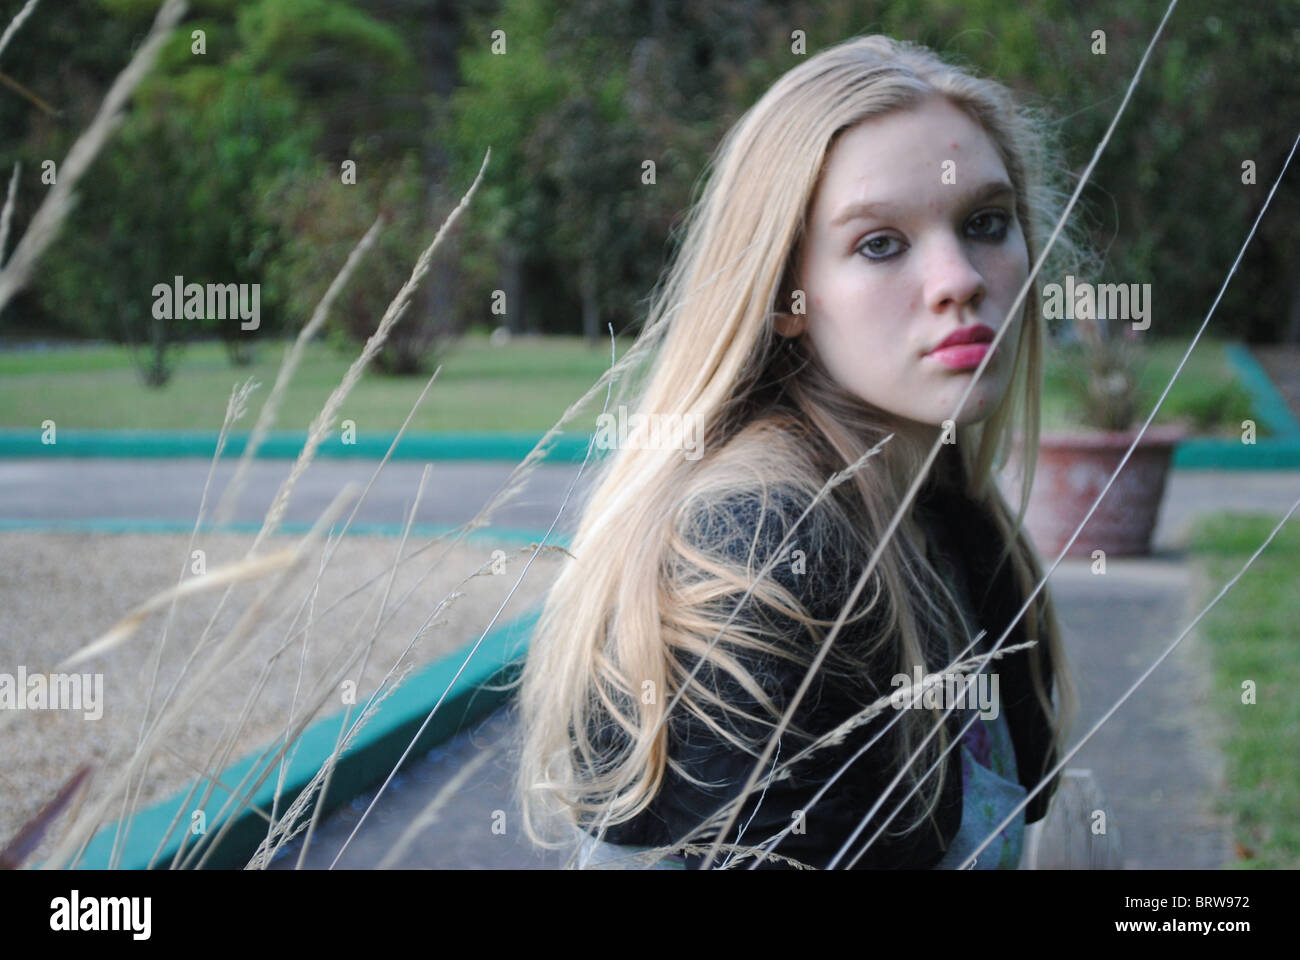 blonde girl reeds wheat outdoors park sullen contemplative - Stock Image